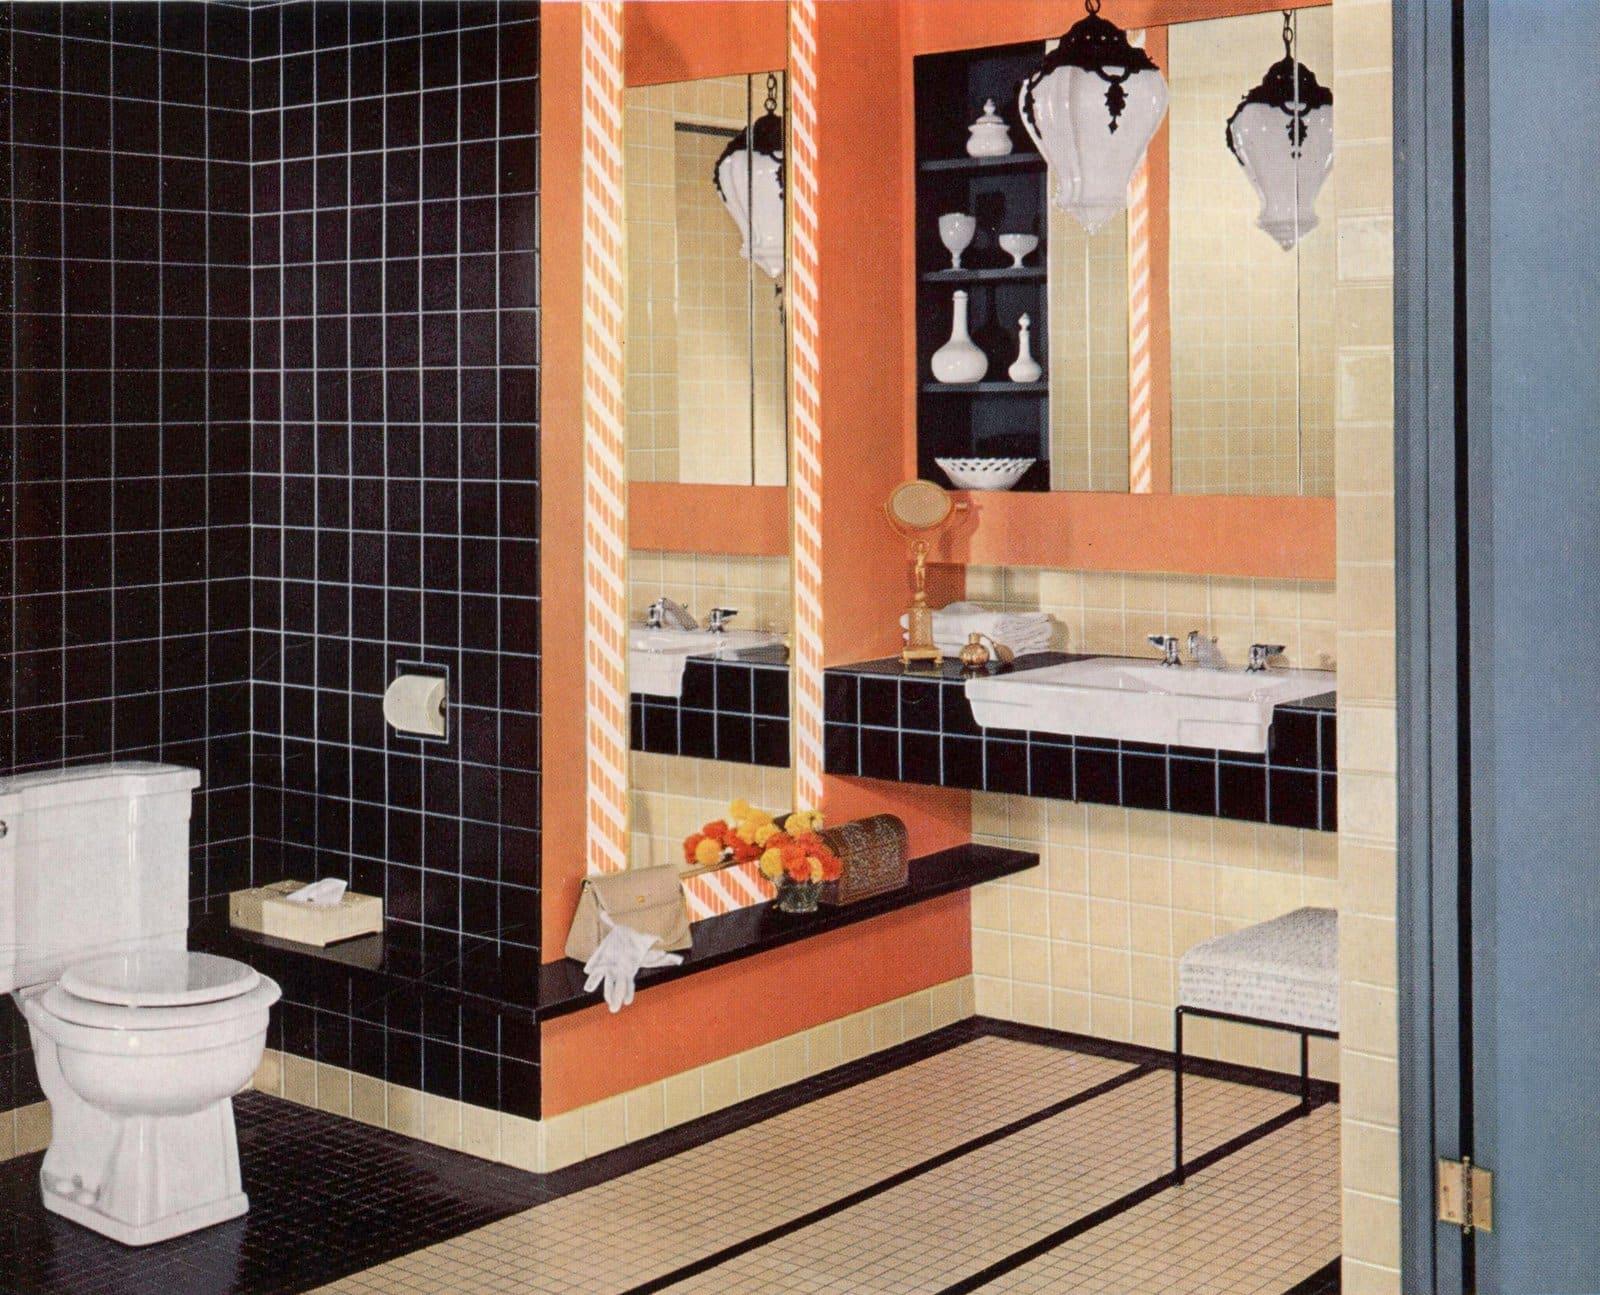 Vintage 1950s bathroom with dark blue tile and orange